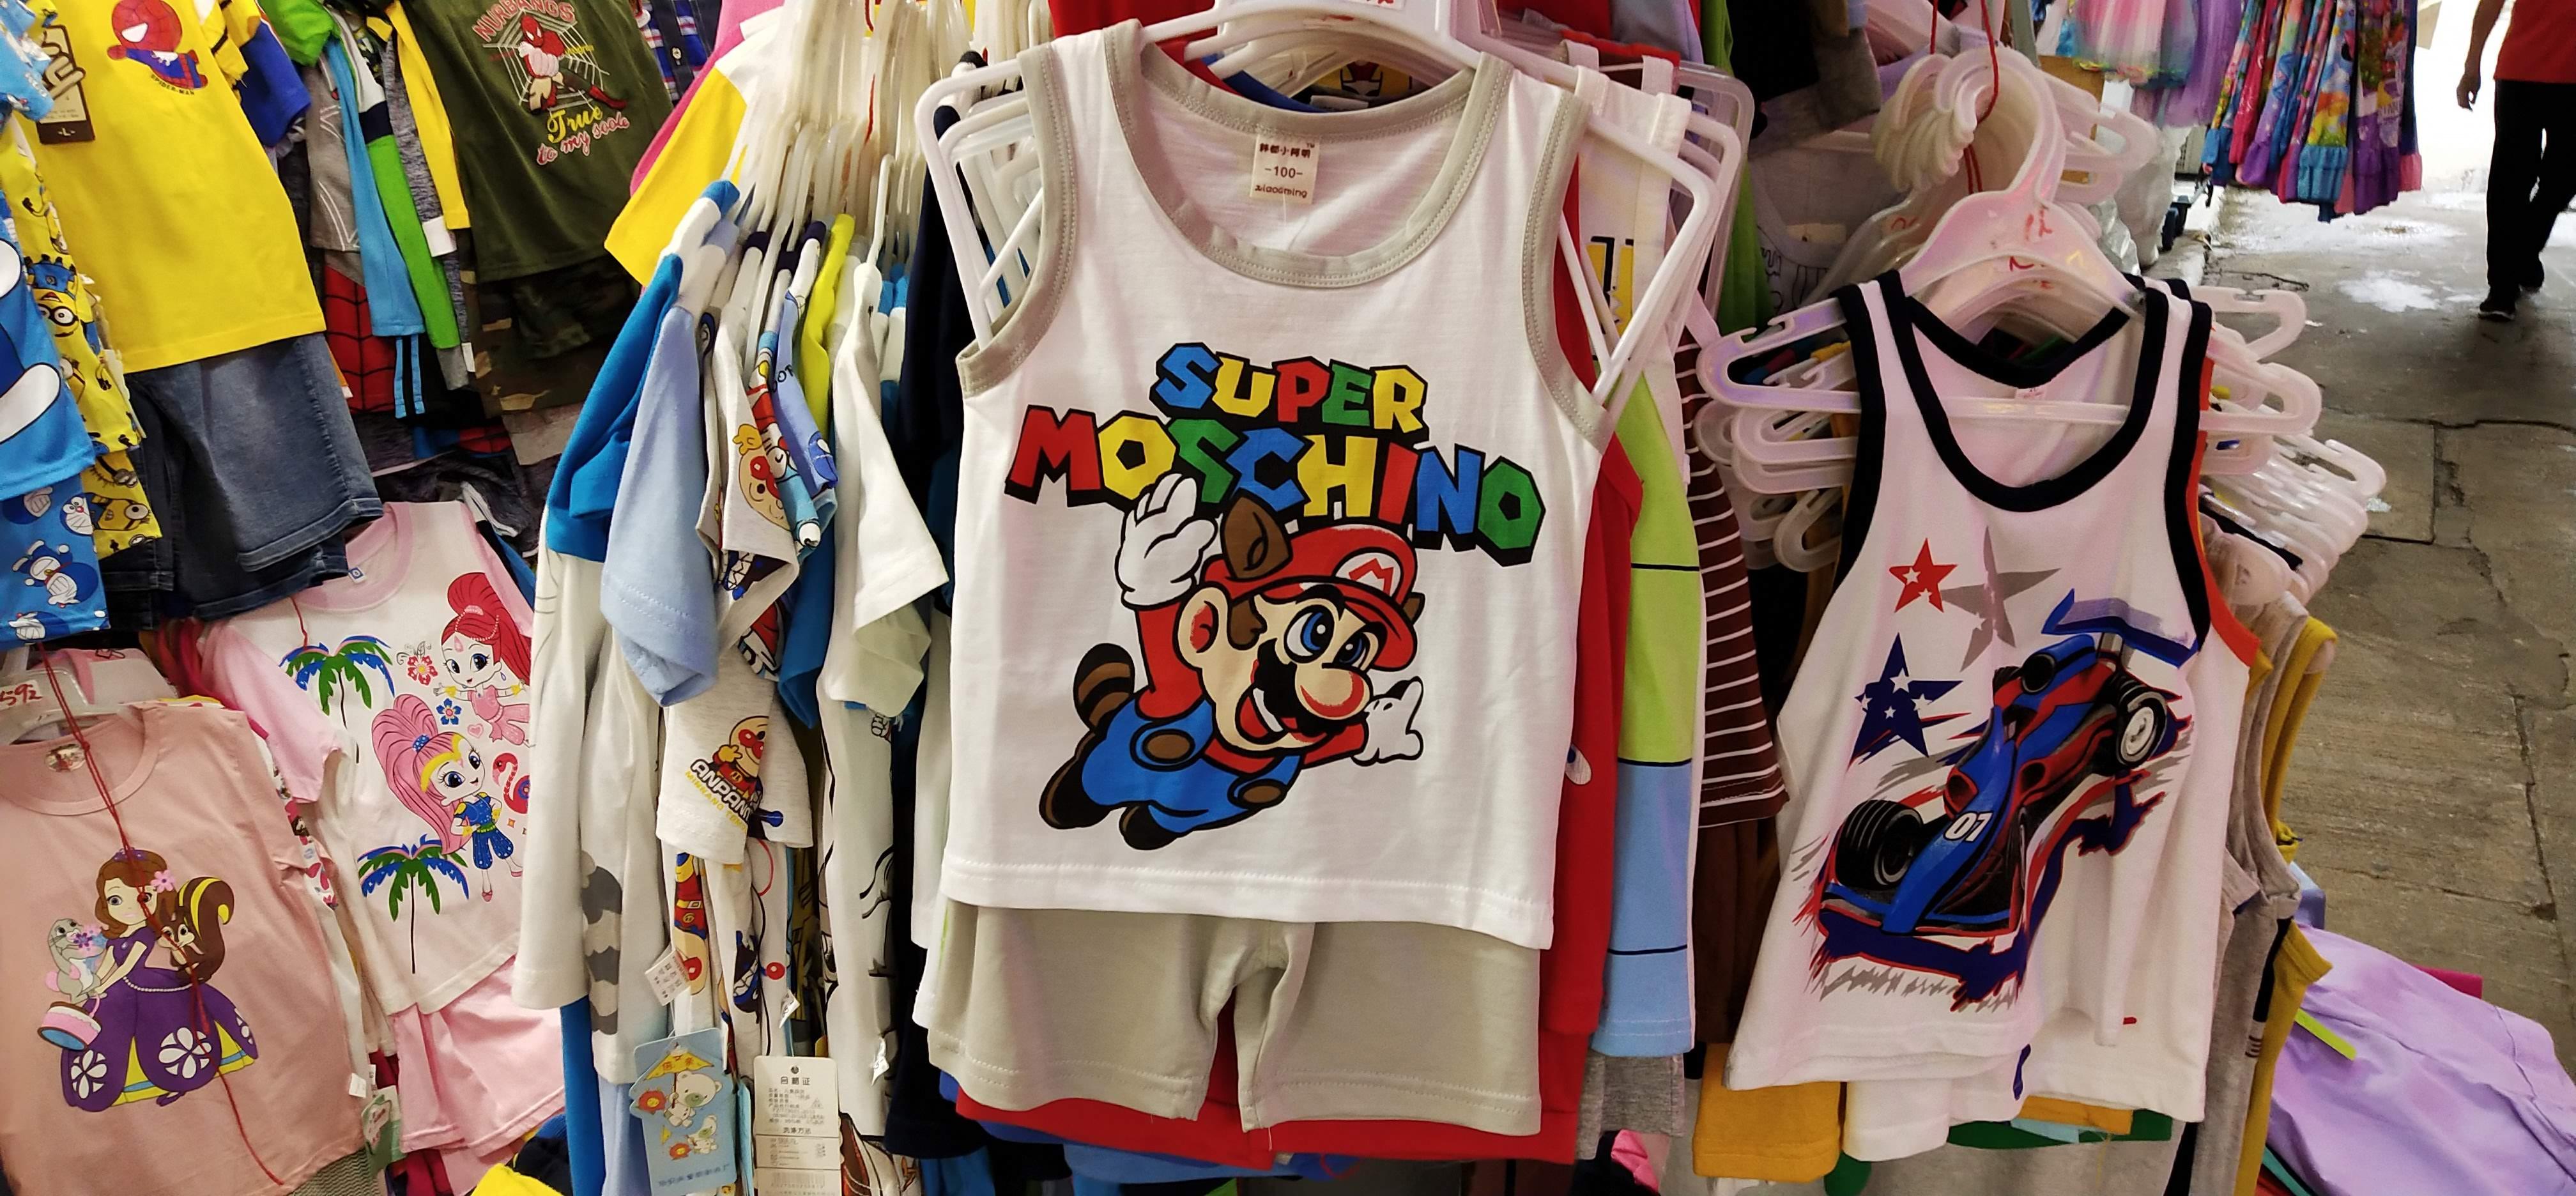 Clothes for kids in in Hau Tei Square Hawker Bazaar